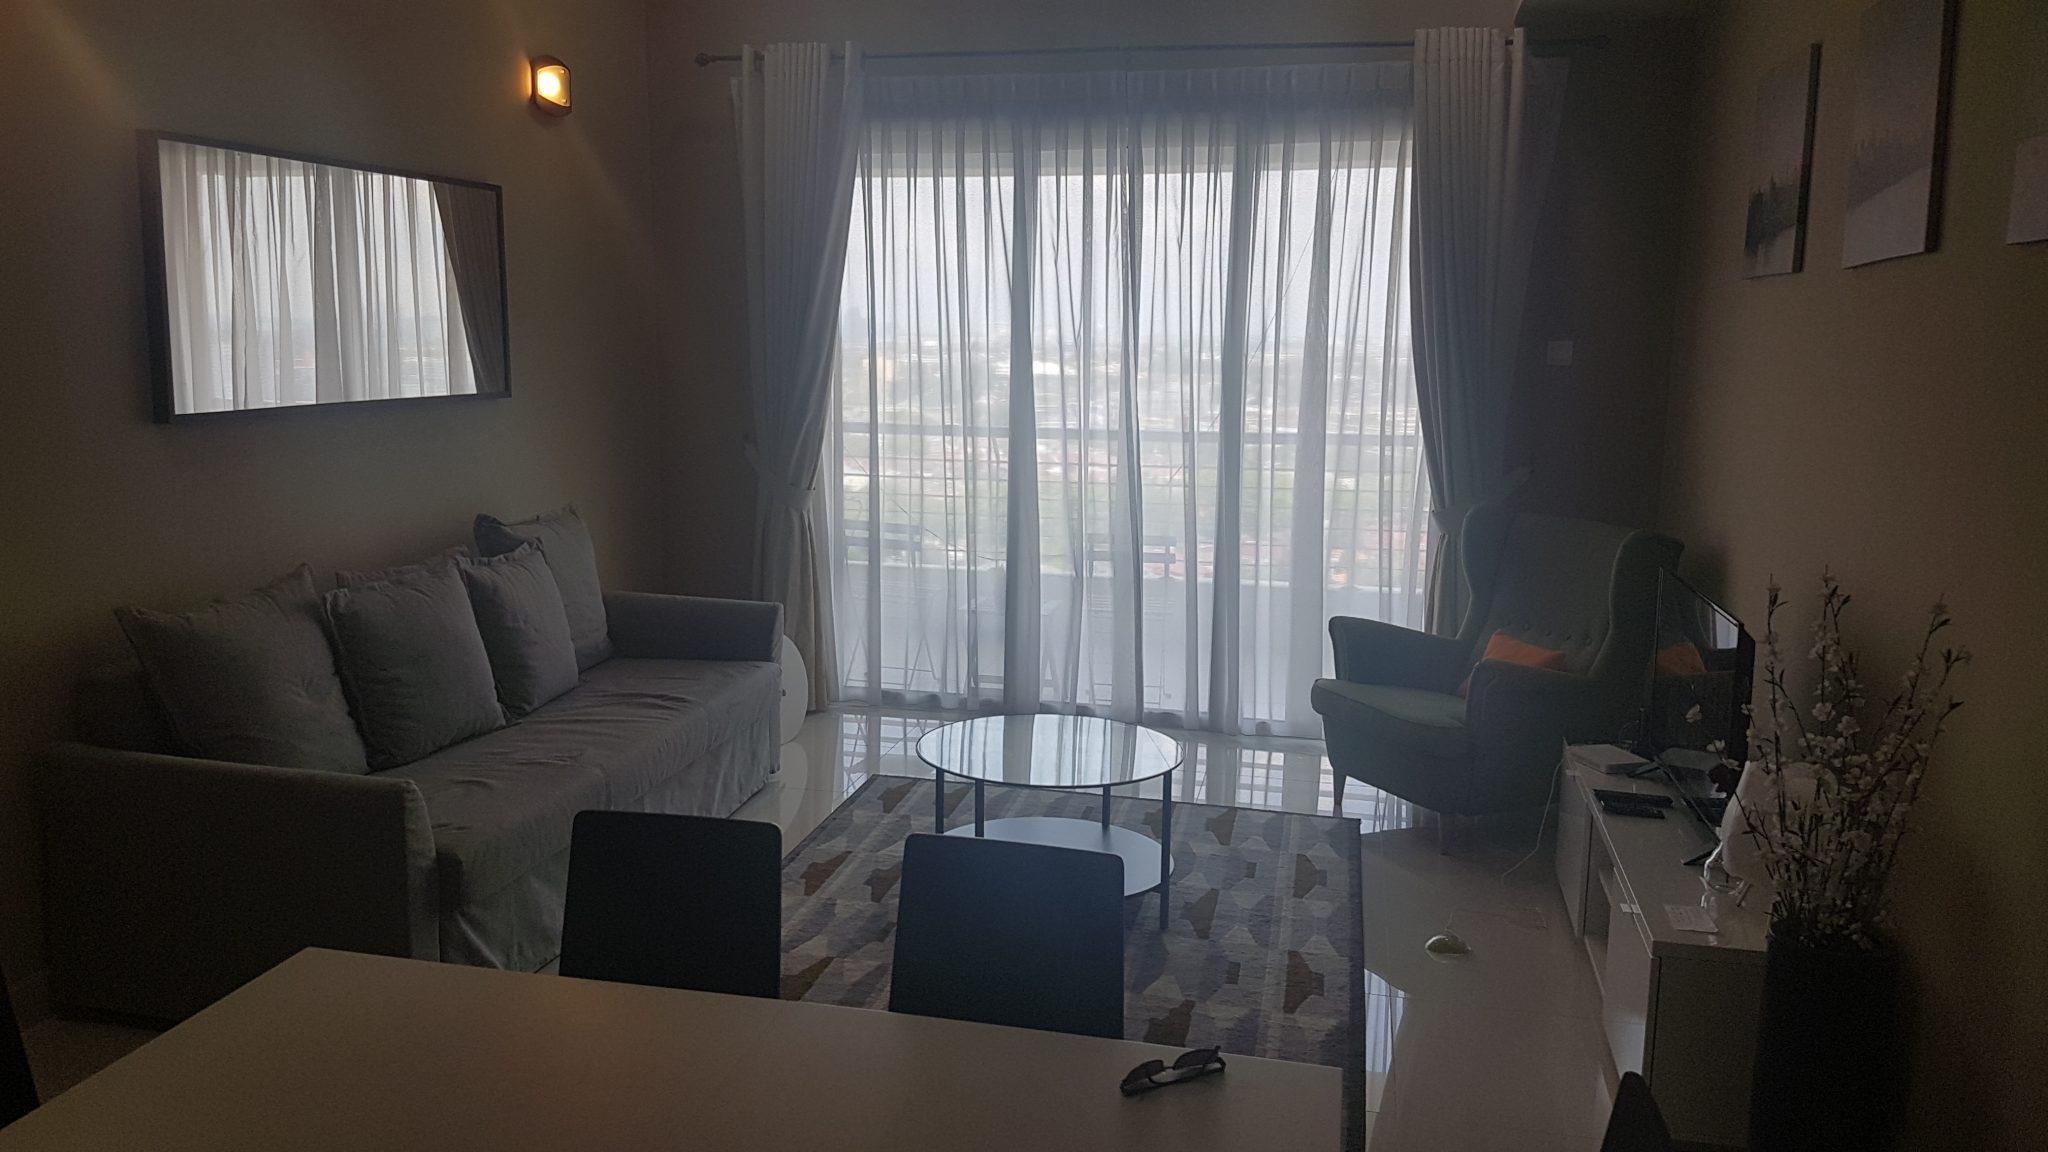 Kuala Lumpur - Airbnb 001 - Backpackjunkies